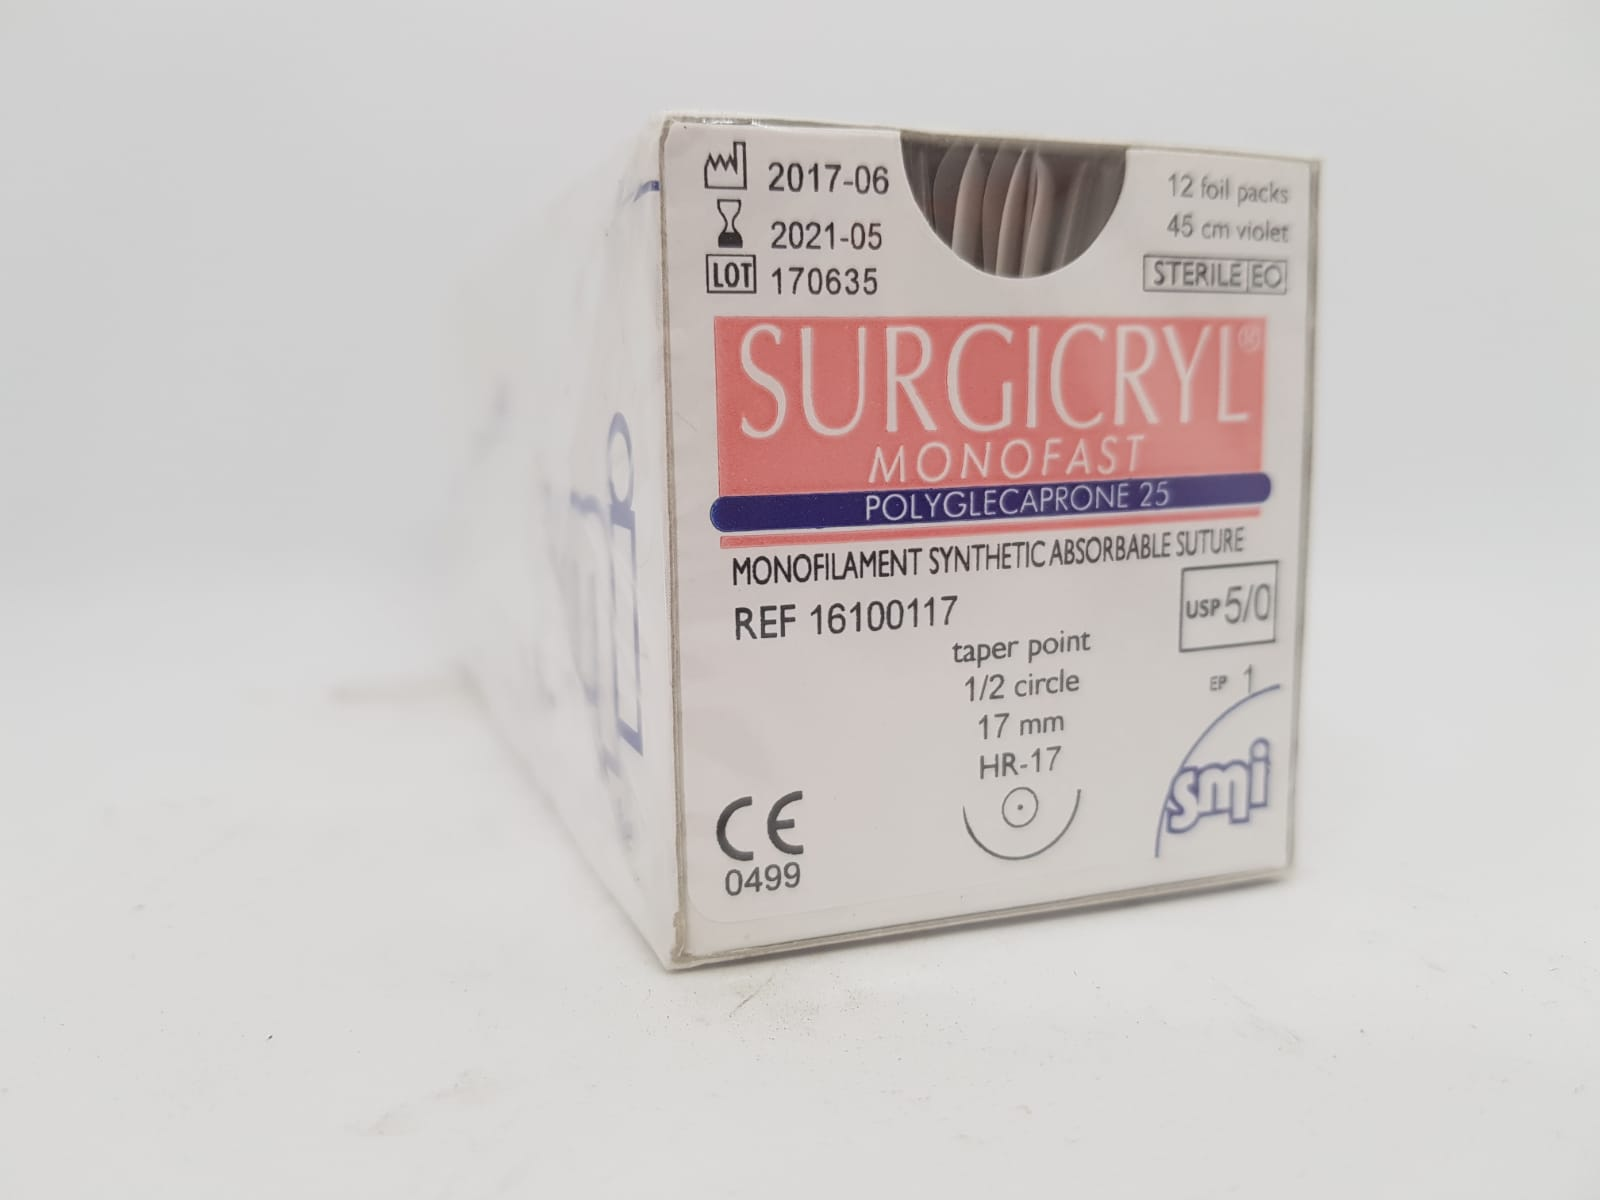 SUTURE SURGICRYL MONOFAST 5/0 DS17 45CM VIOLET BOX 12